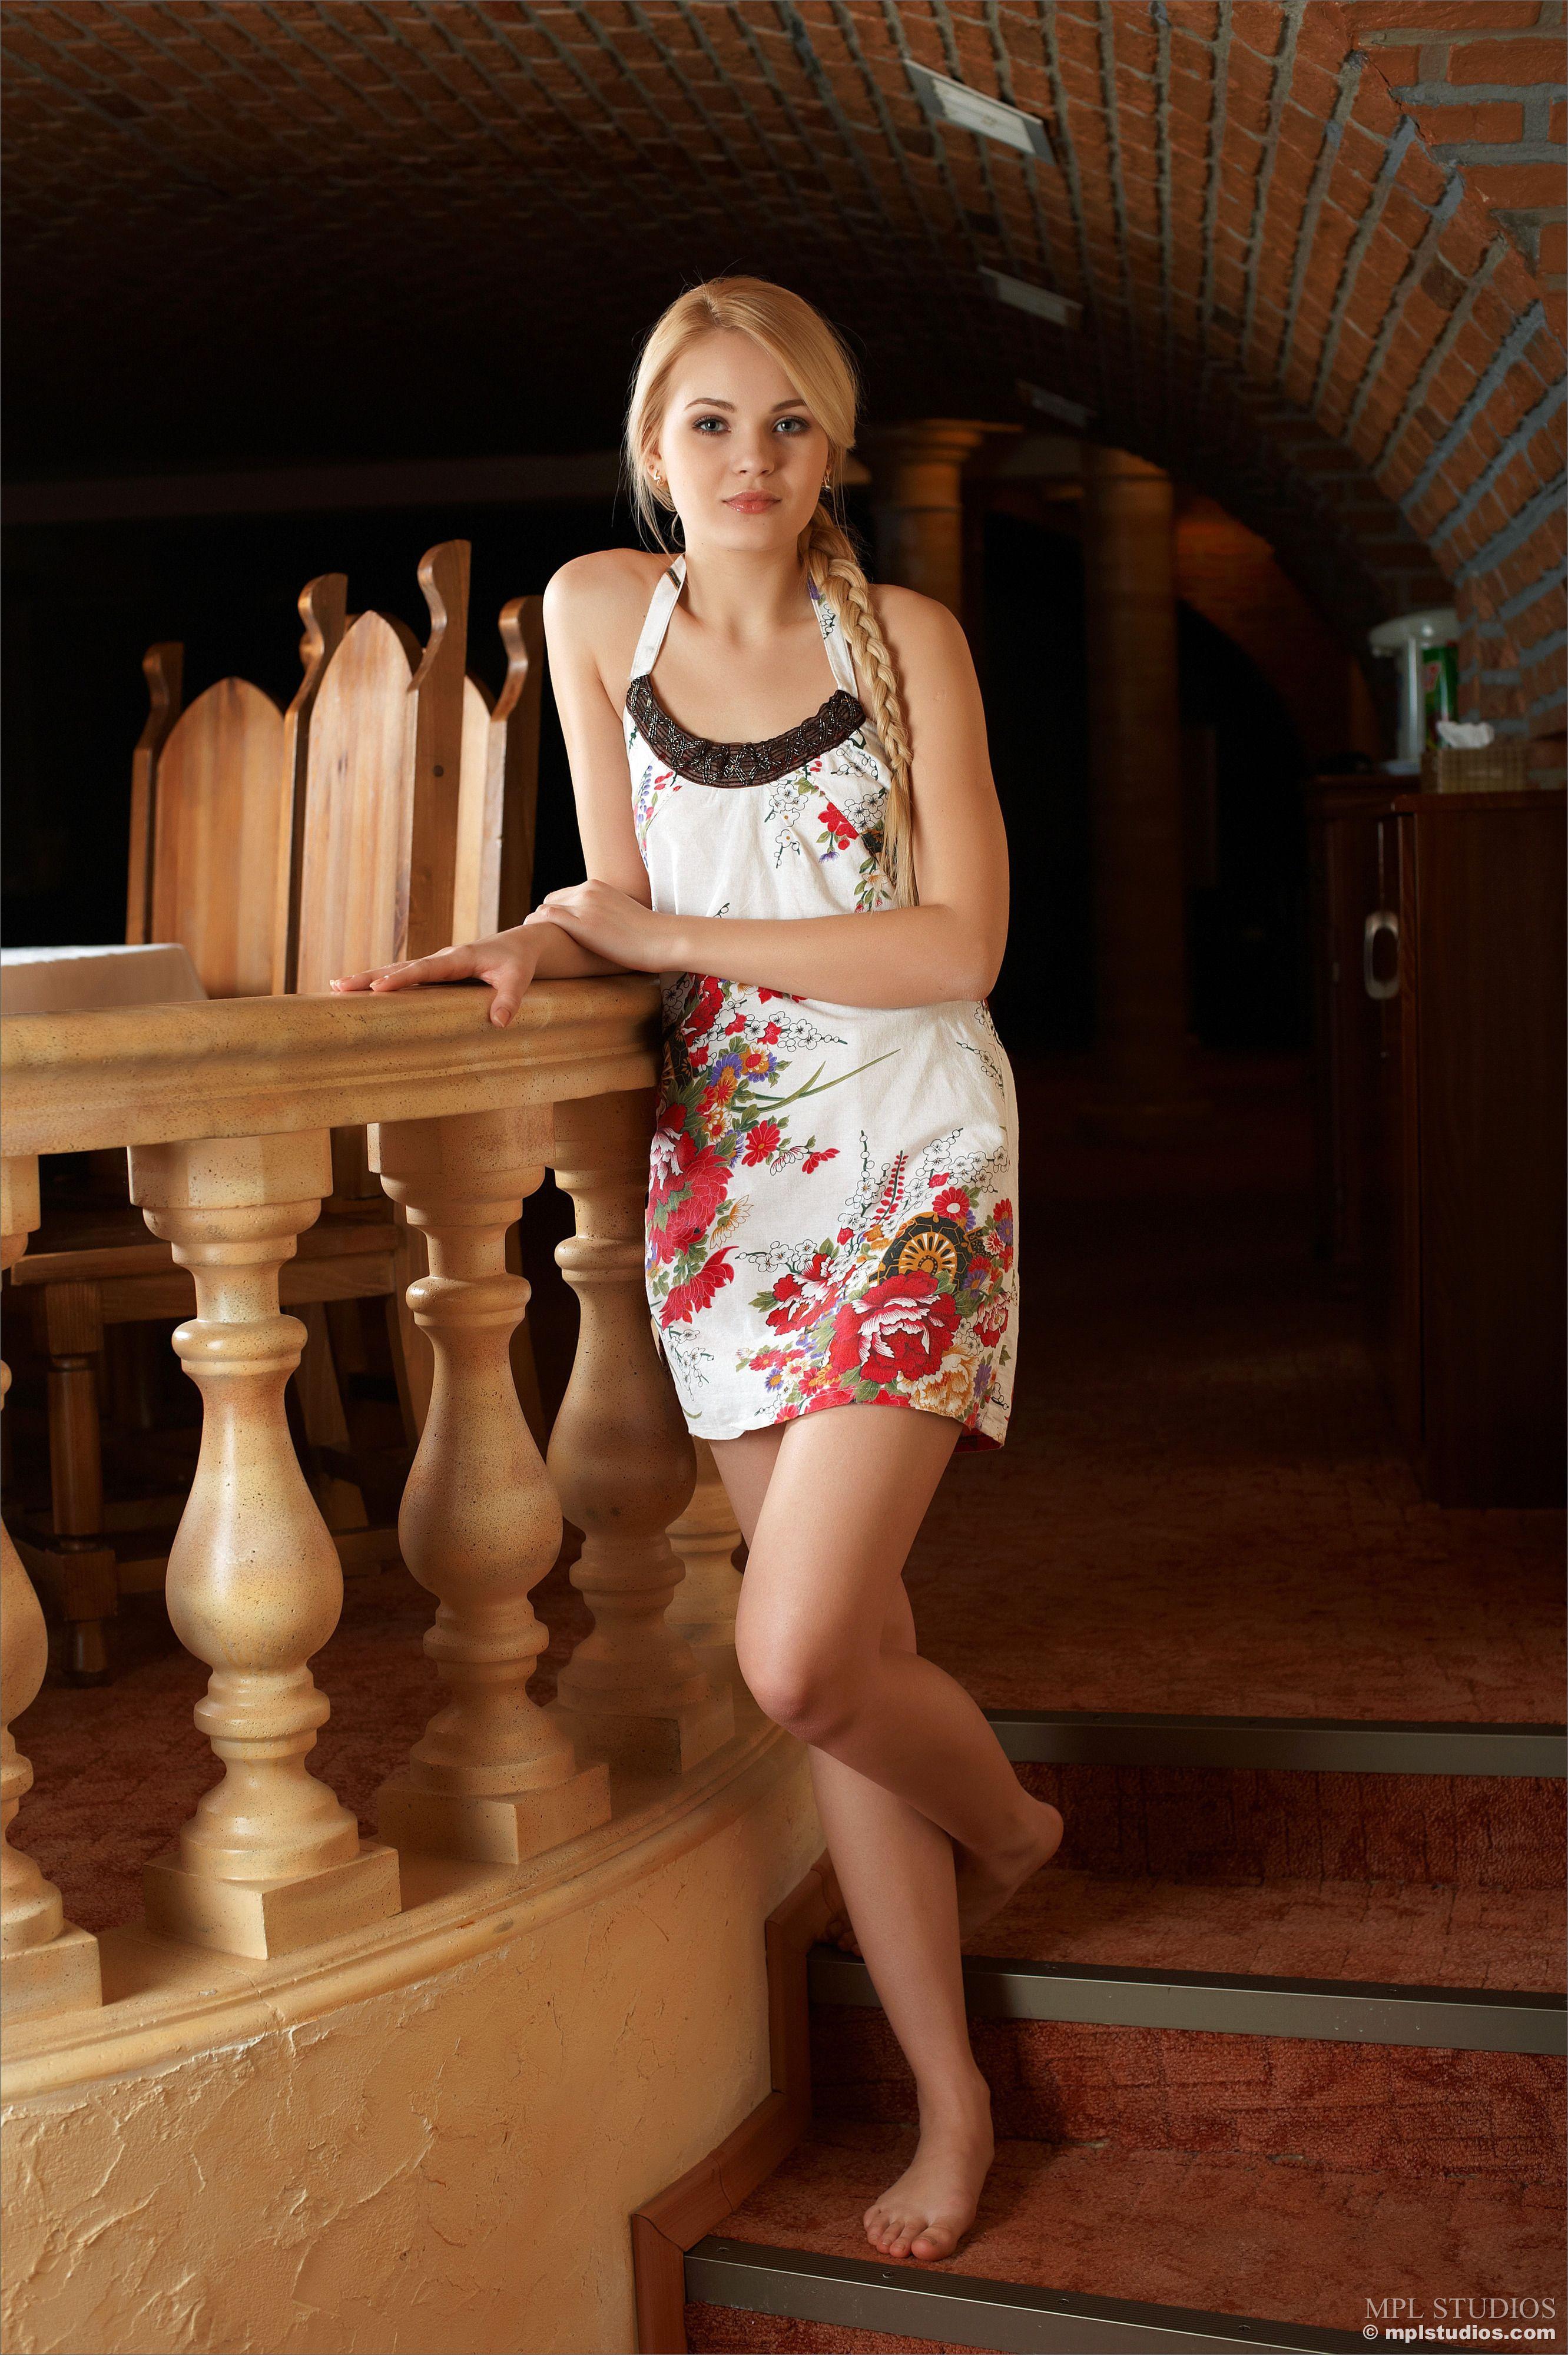 http://i4.imageban.ru/out/2016/09/12/bccfeb643692f62df2b49fb9a9f2d472.jpg